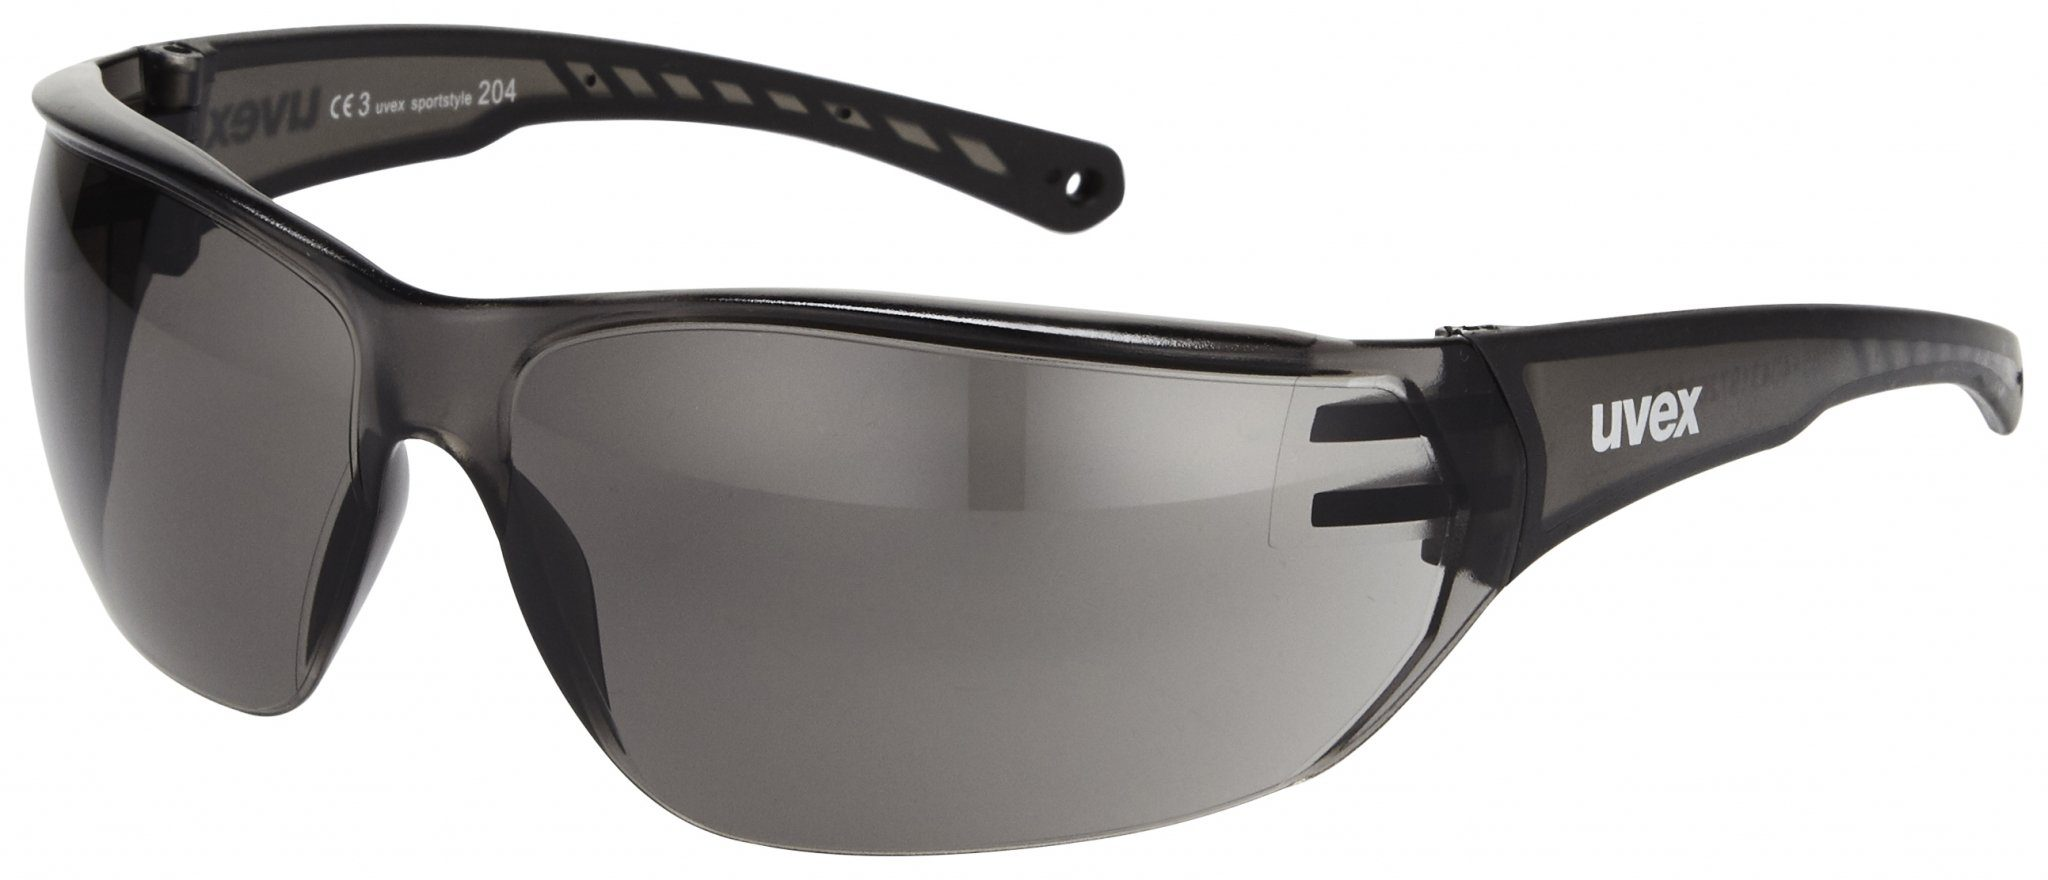 Uvex Radsportbrille »sportstyle 204 Glasses«